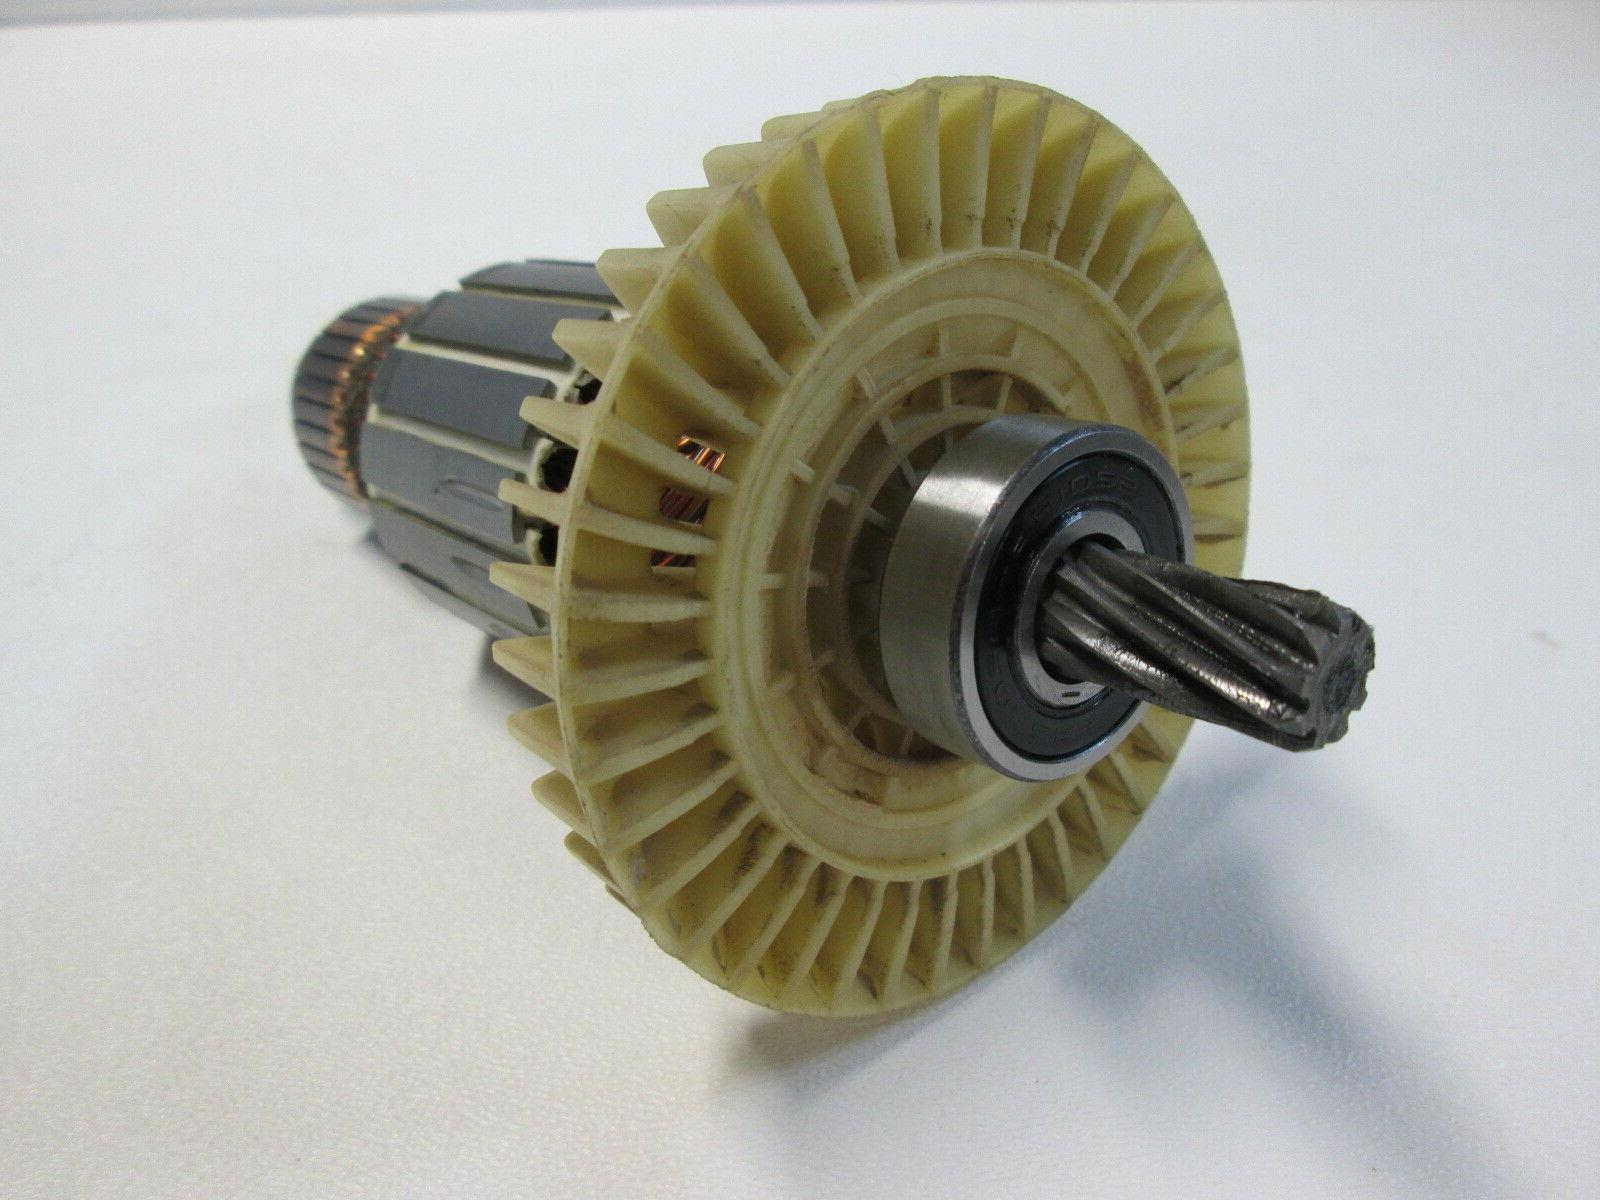 Sears RM871 Rebuild Kit Motorized